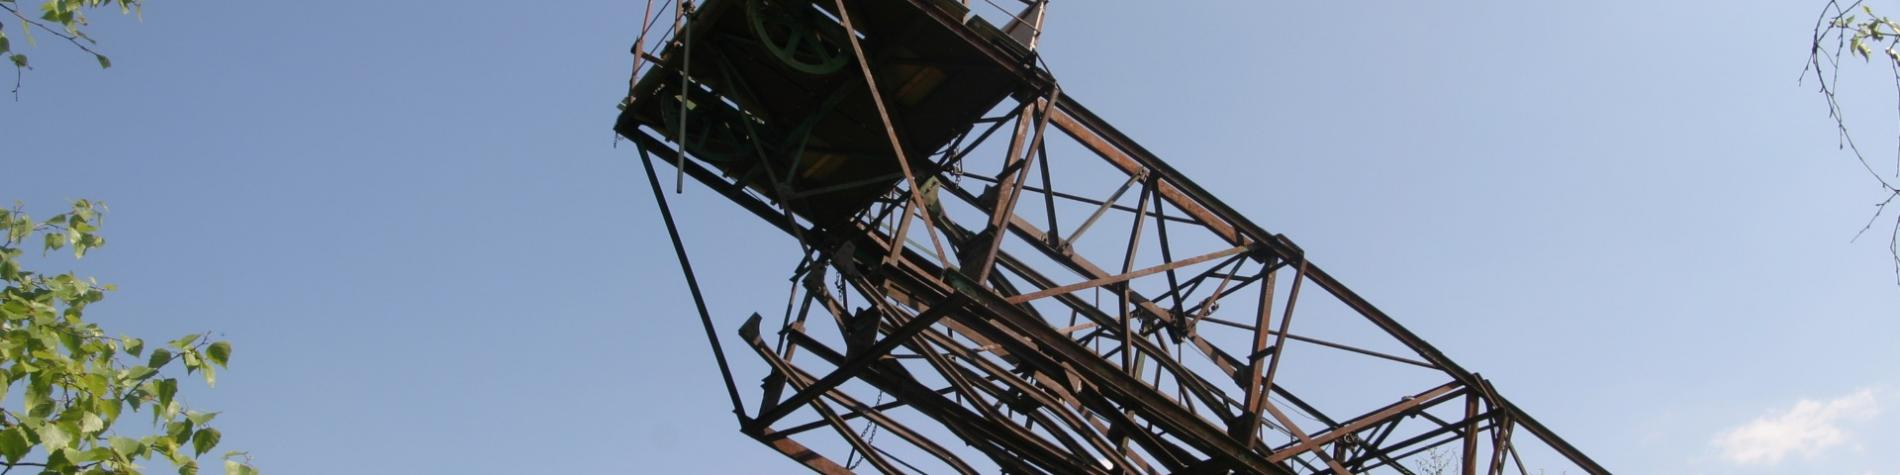 Blegny-Mine Terril